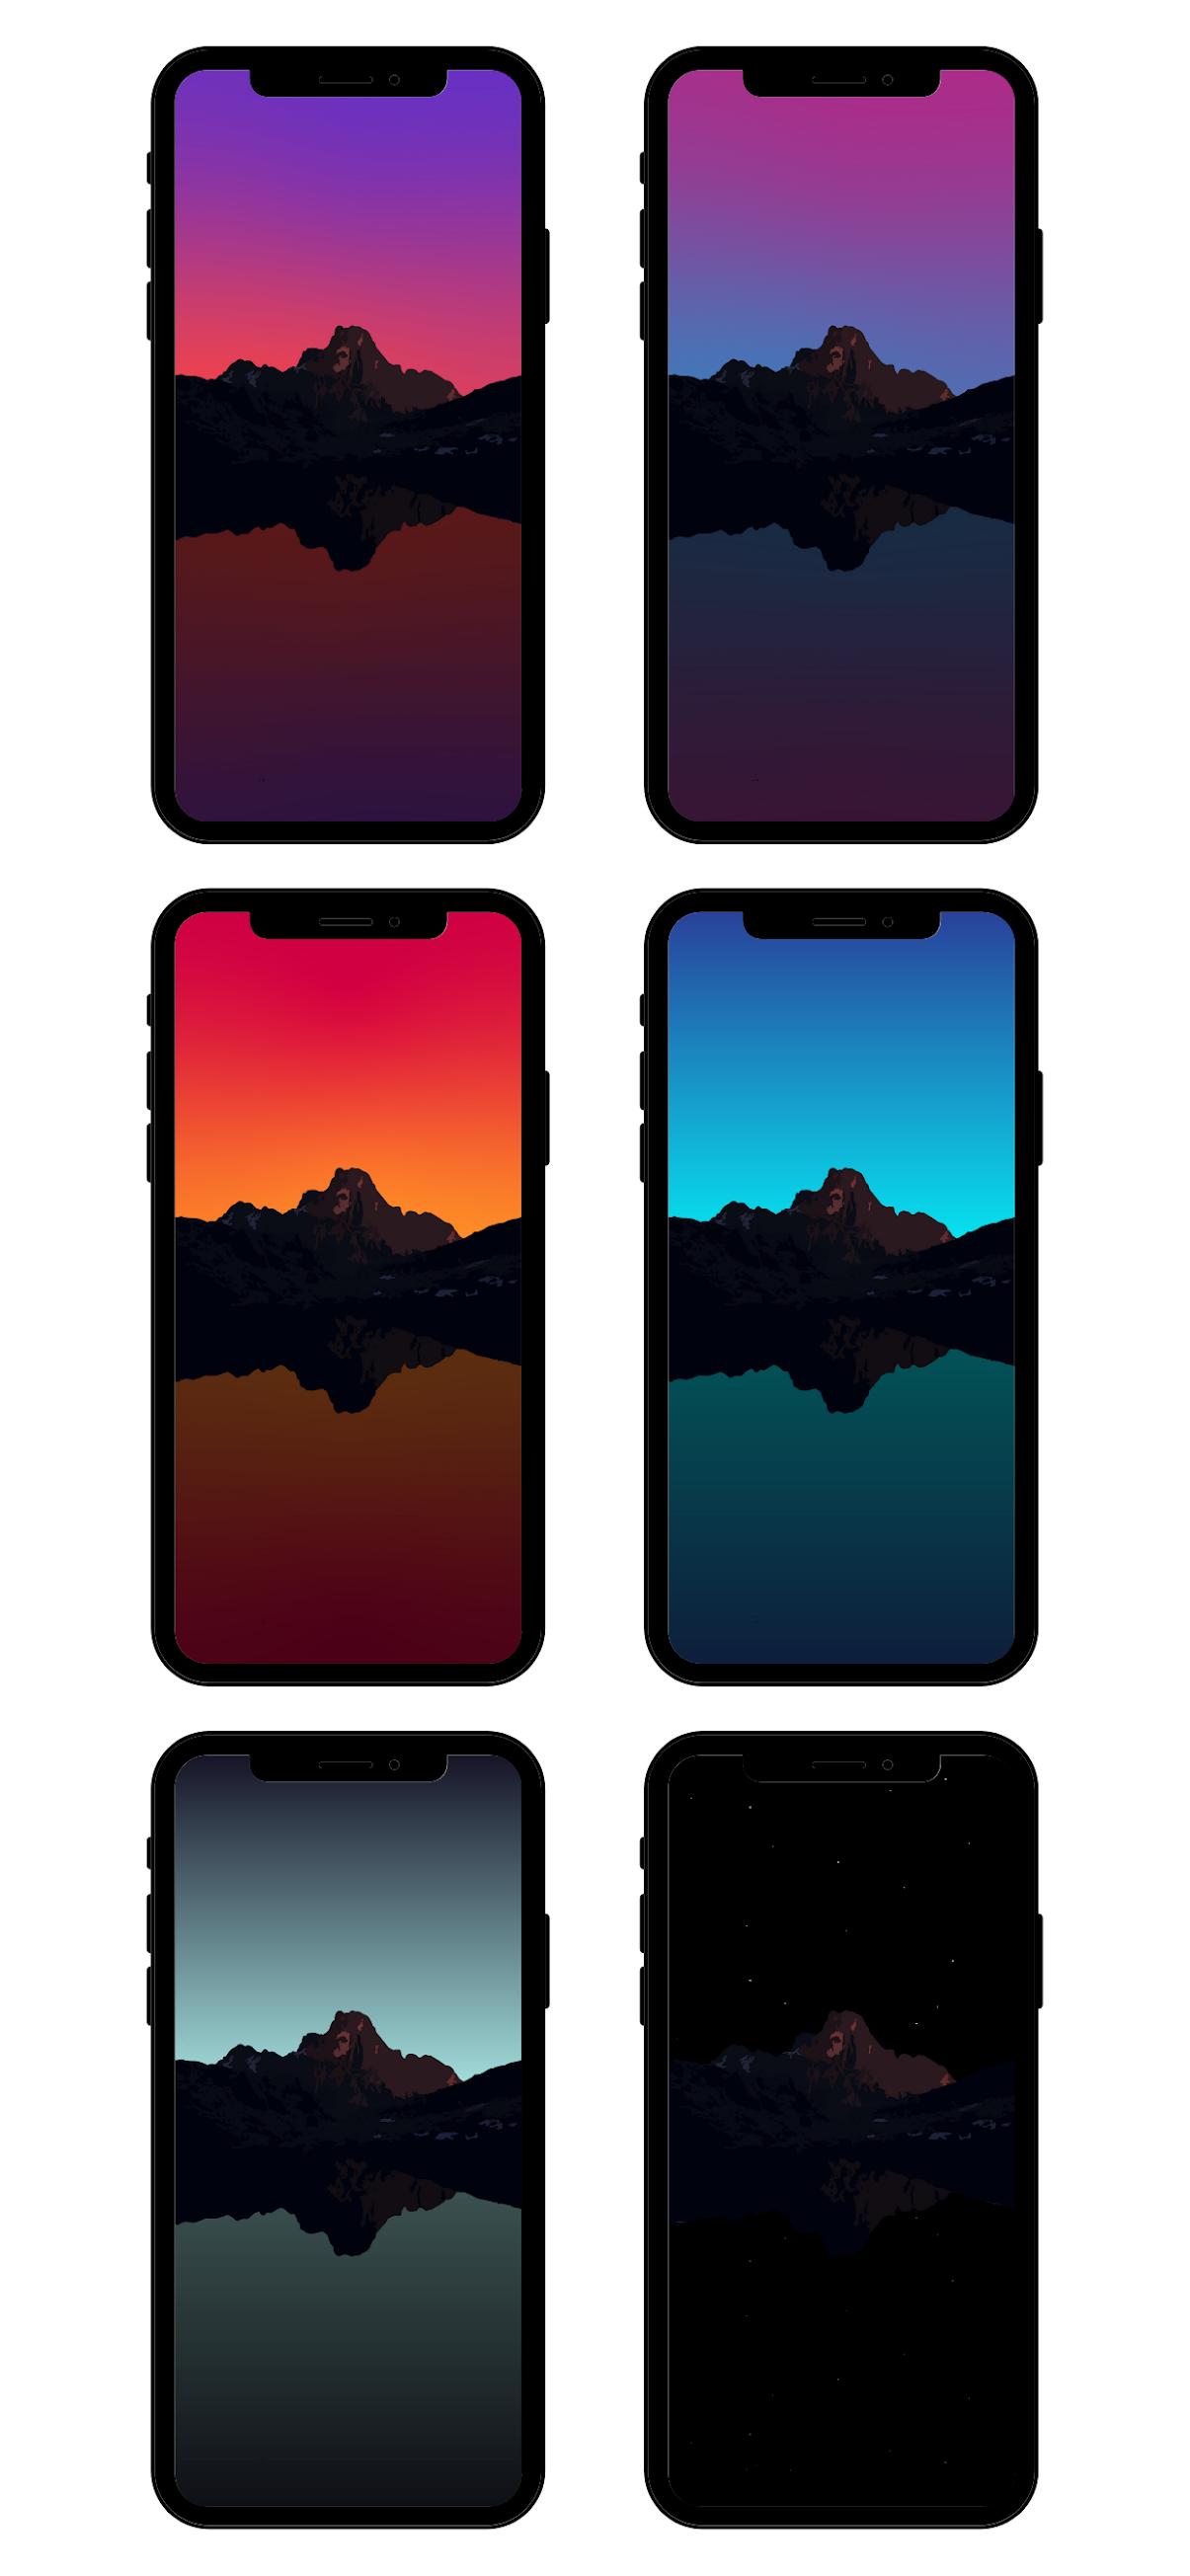 iphone-wallpaper-hd